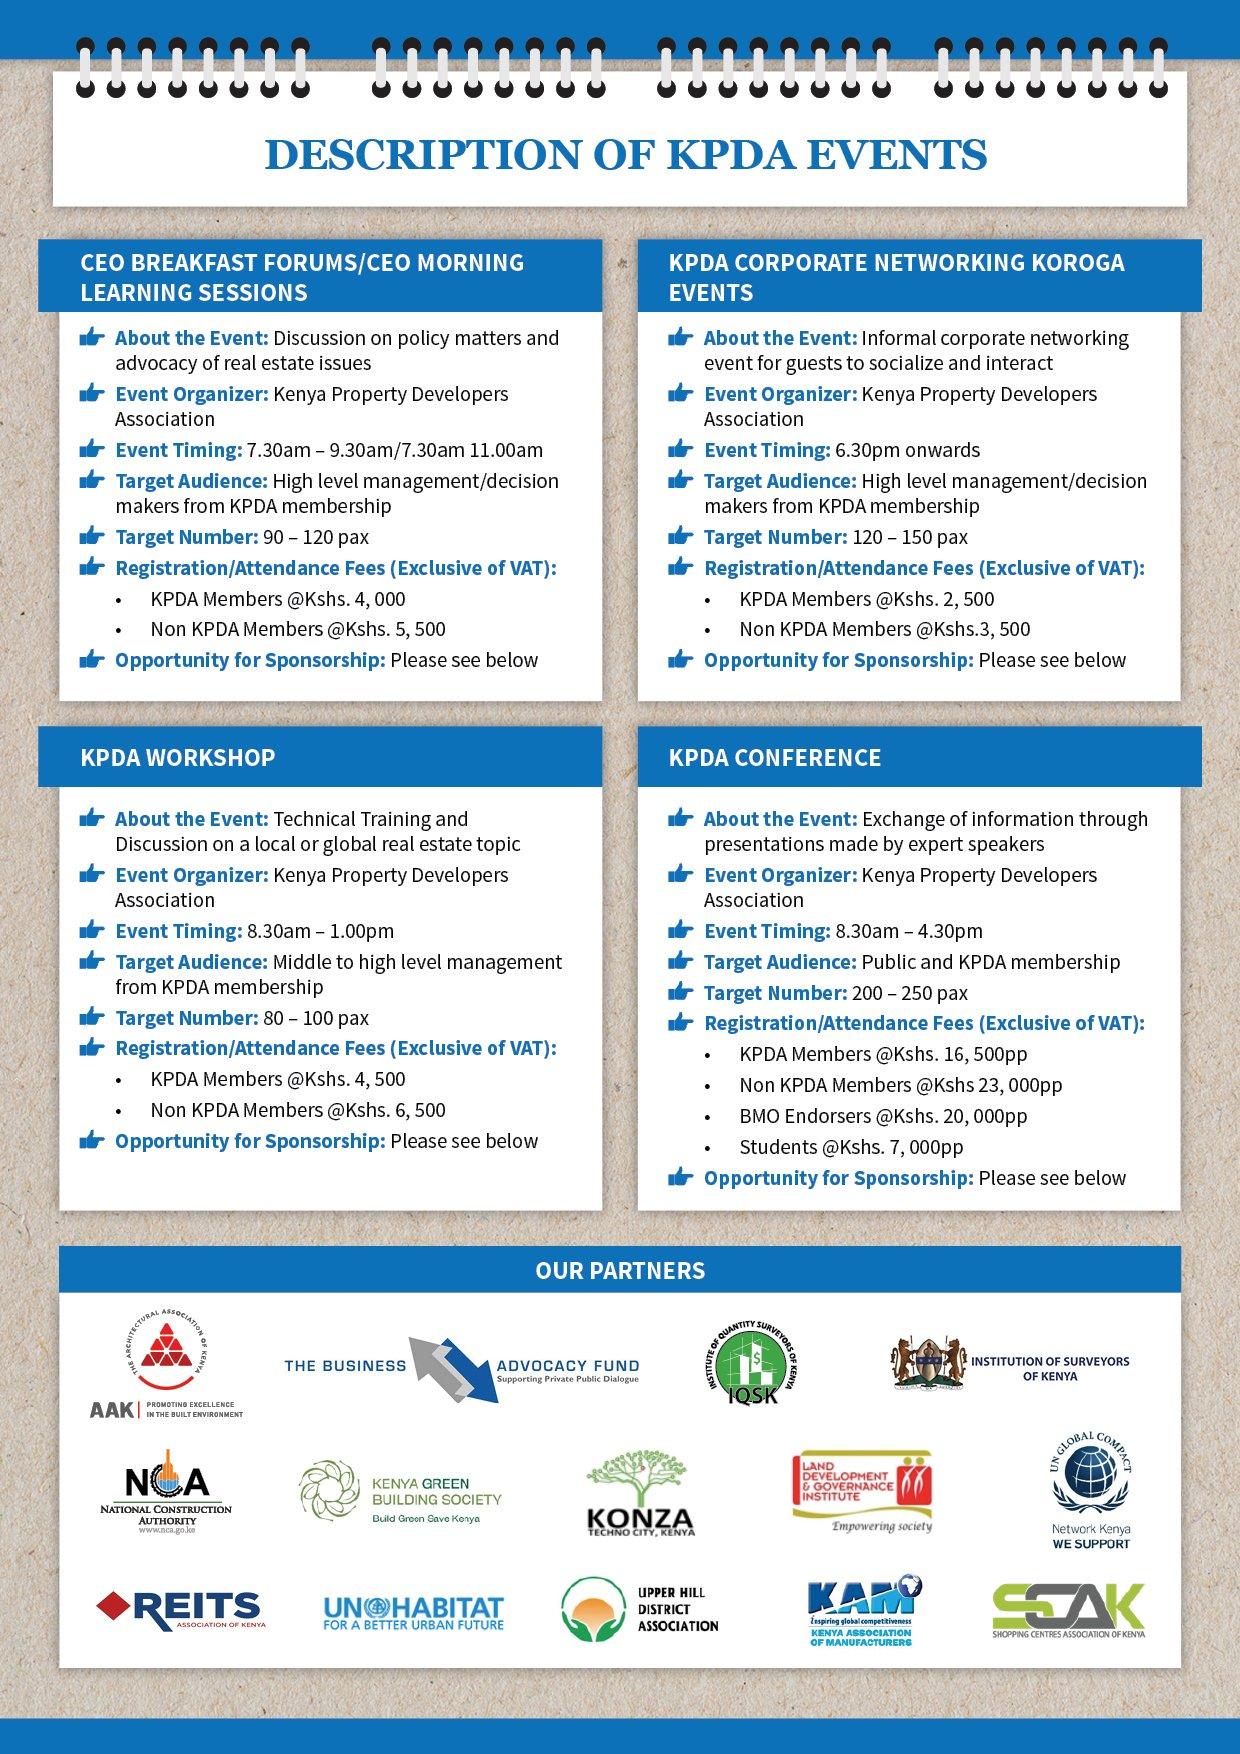 2019 Kpda Calendar Of Events – Kenya Property Developers Association Calendar 2019 At Target